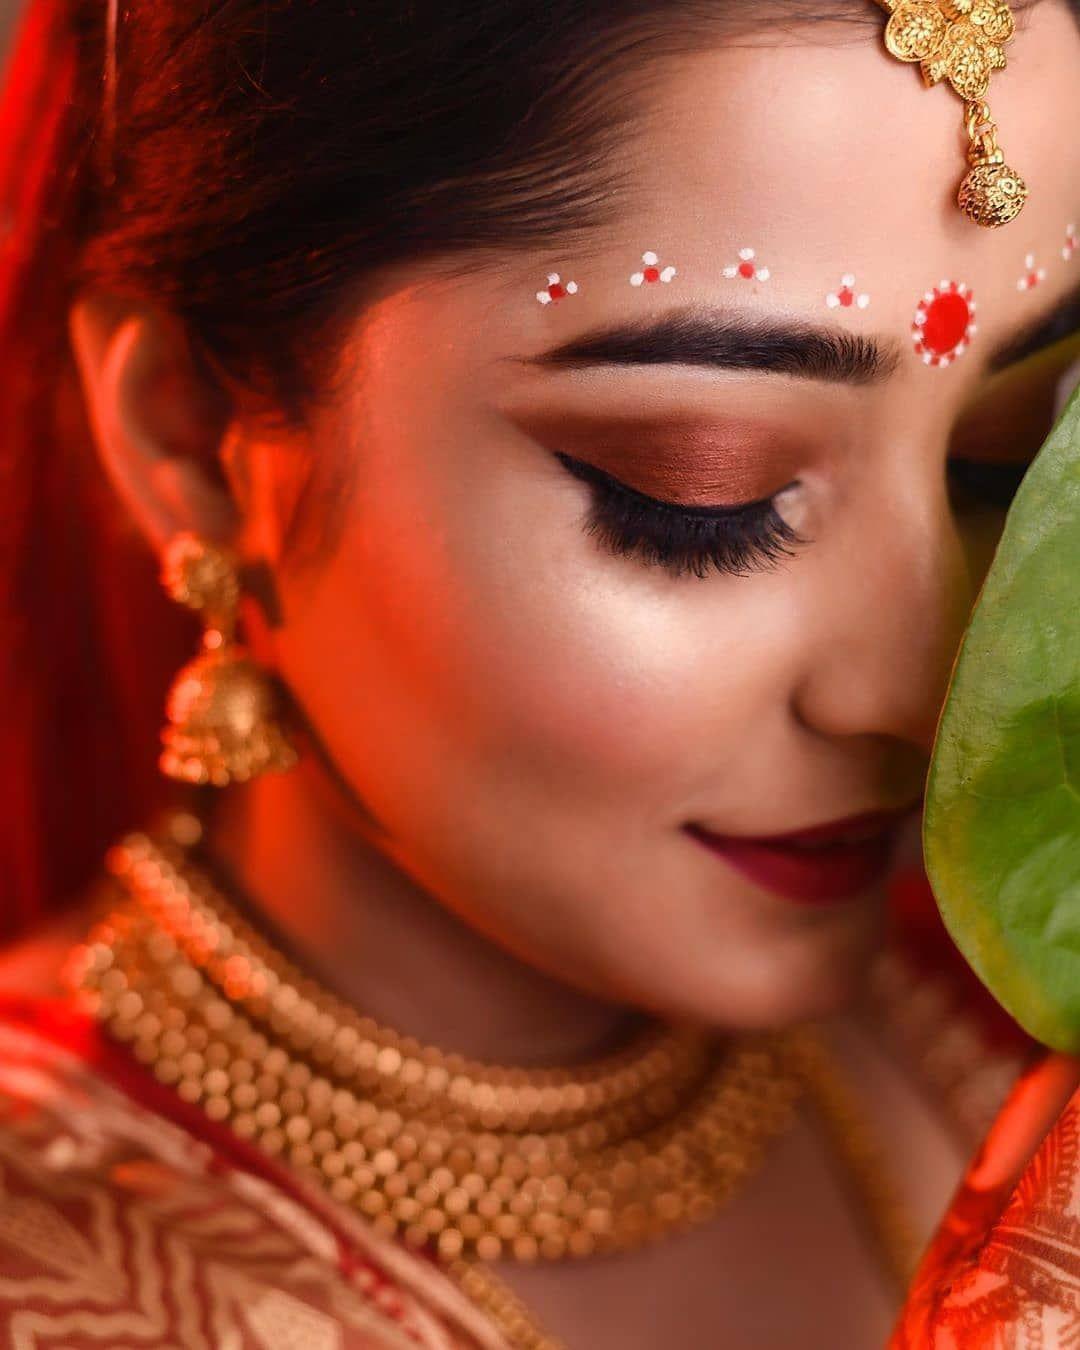 10 Bengali Bridal Kumkum Chandan Designs That Are Khuba Sundara Bengali Bridal Makeup Bridal Makeup Images Indian Bride Makeup